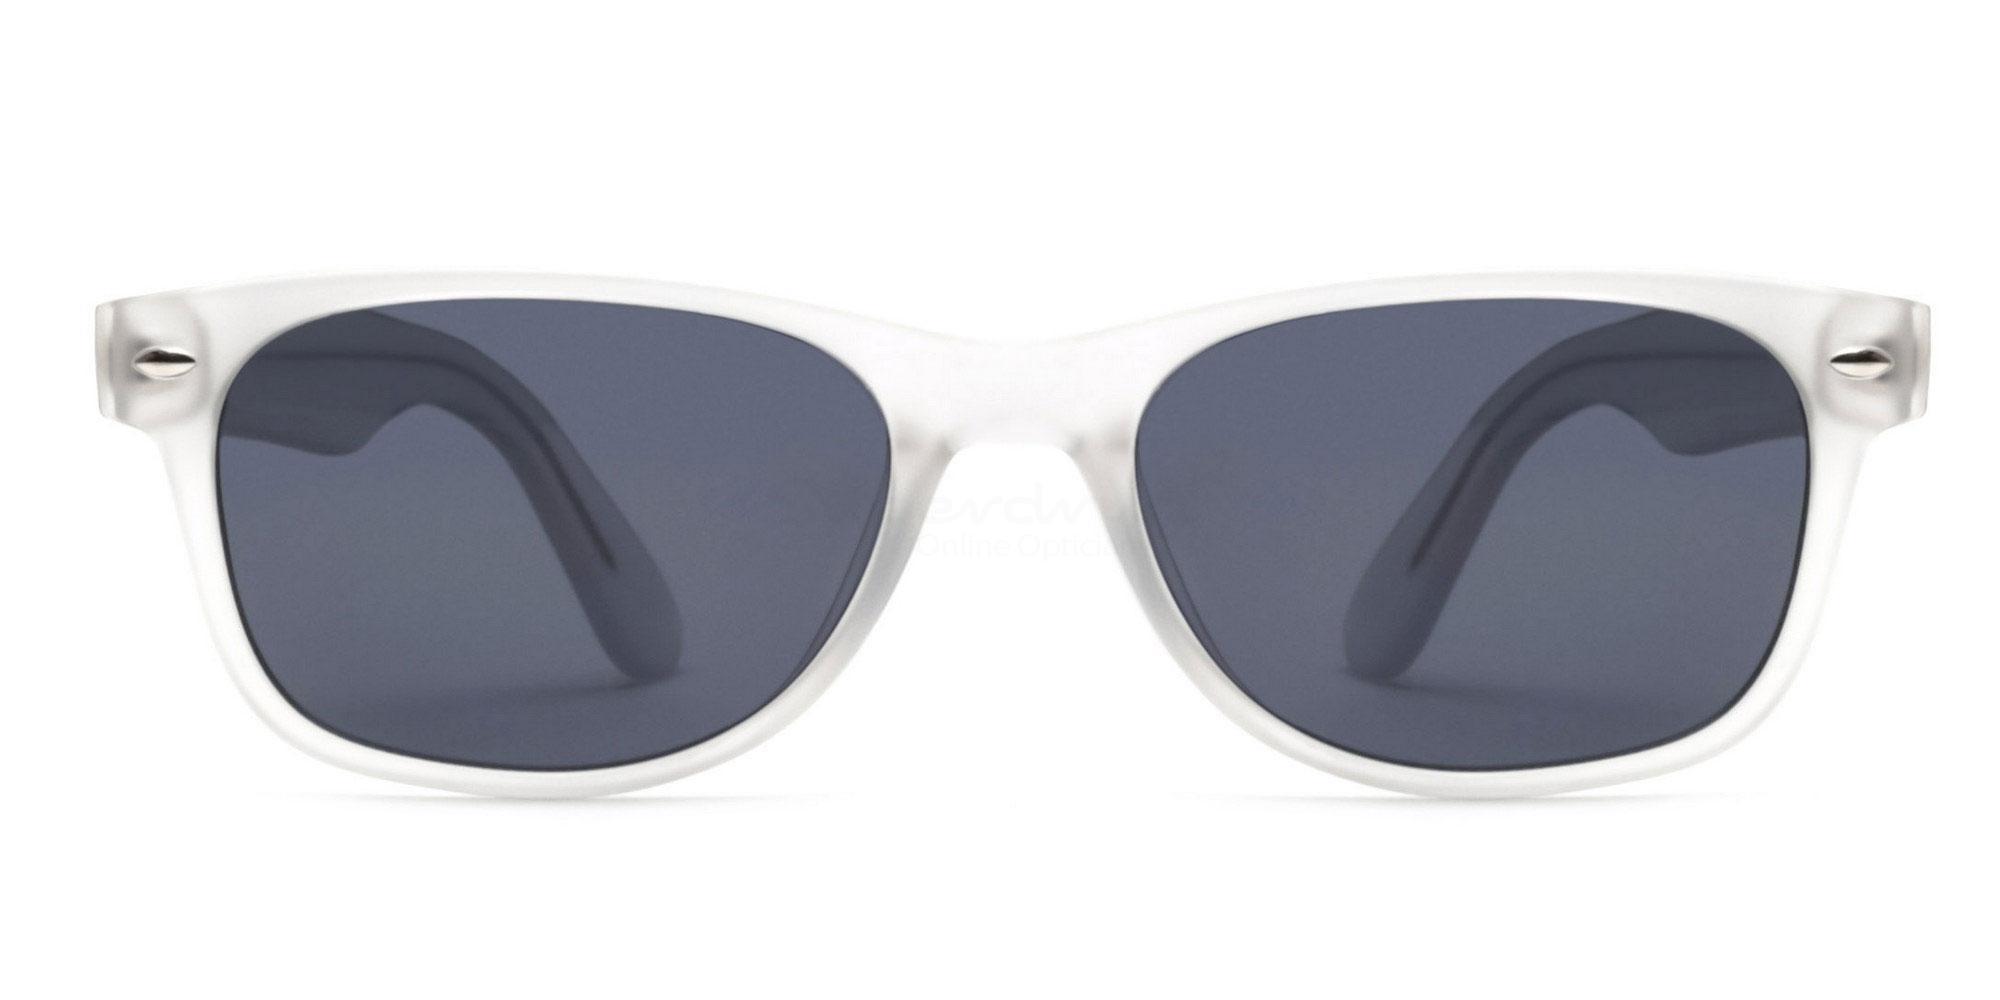 Clear S8122 - Clear (Sunglasses) Sunglasses, Helium